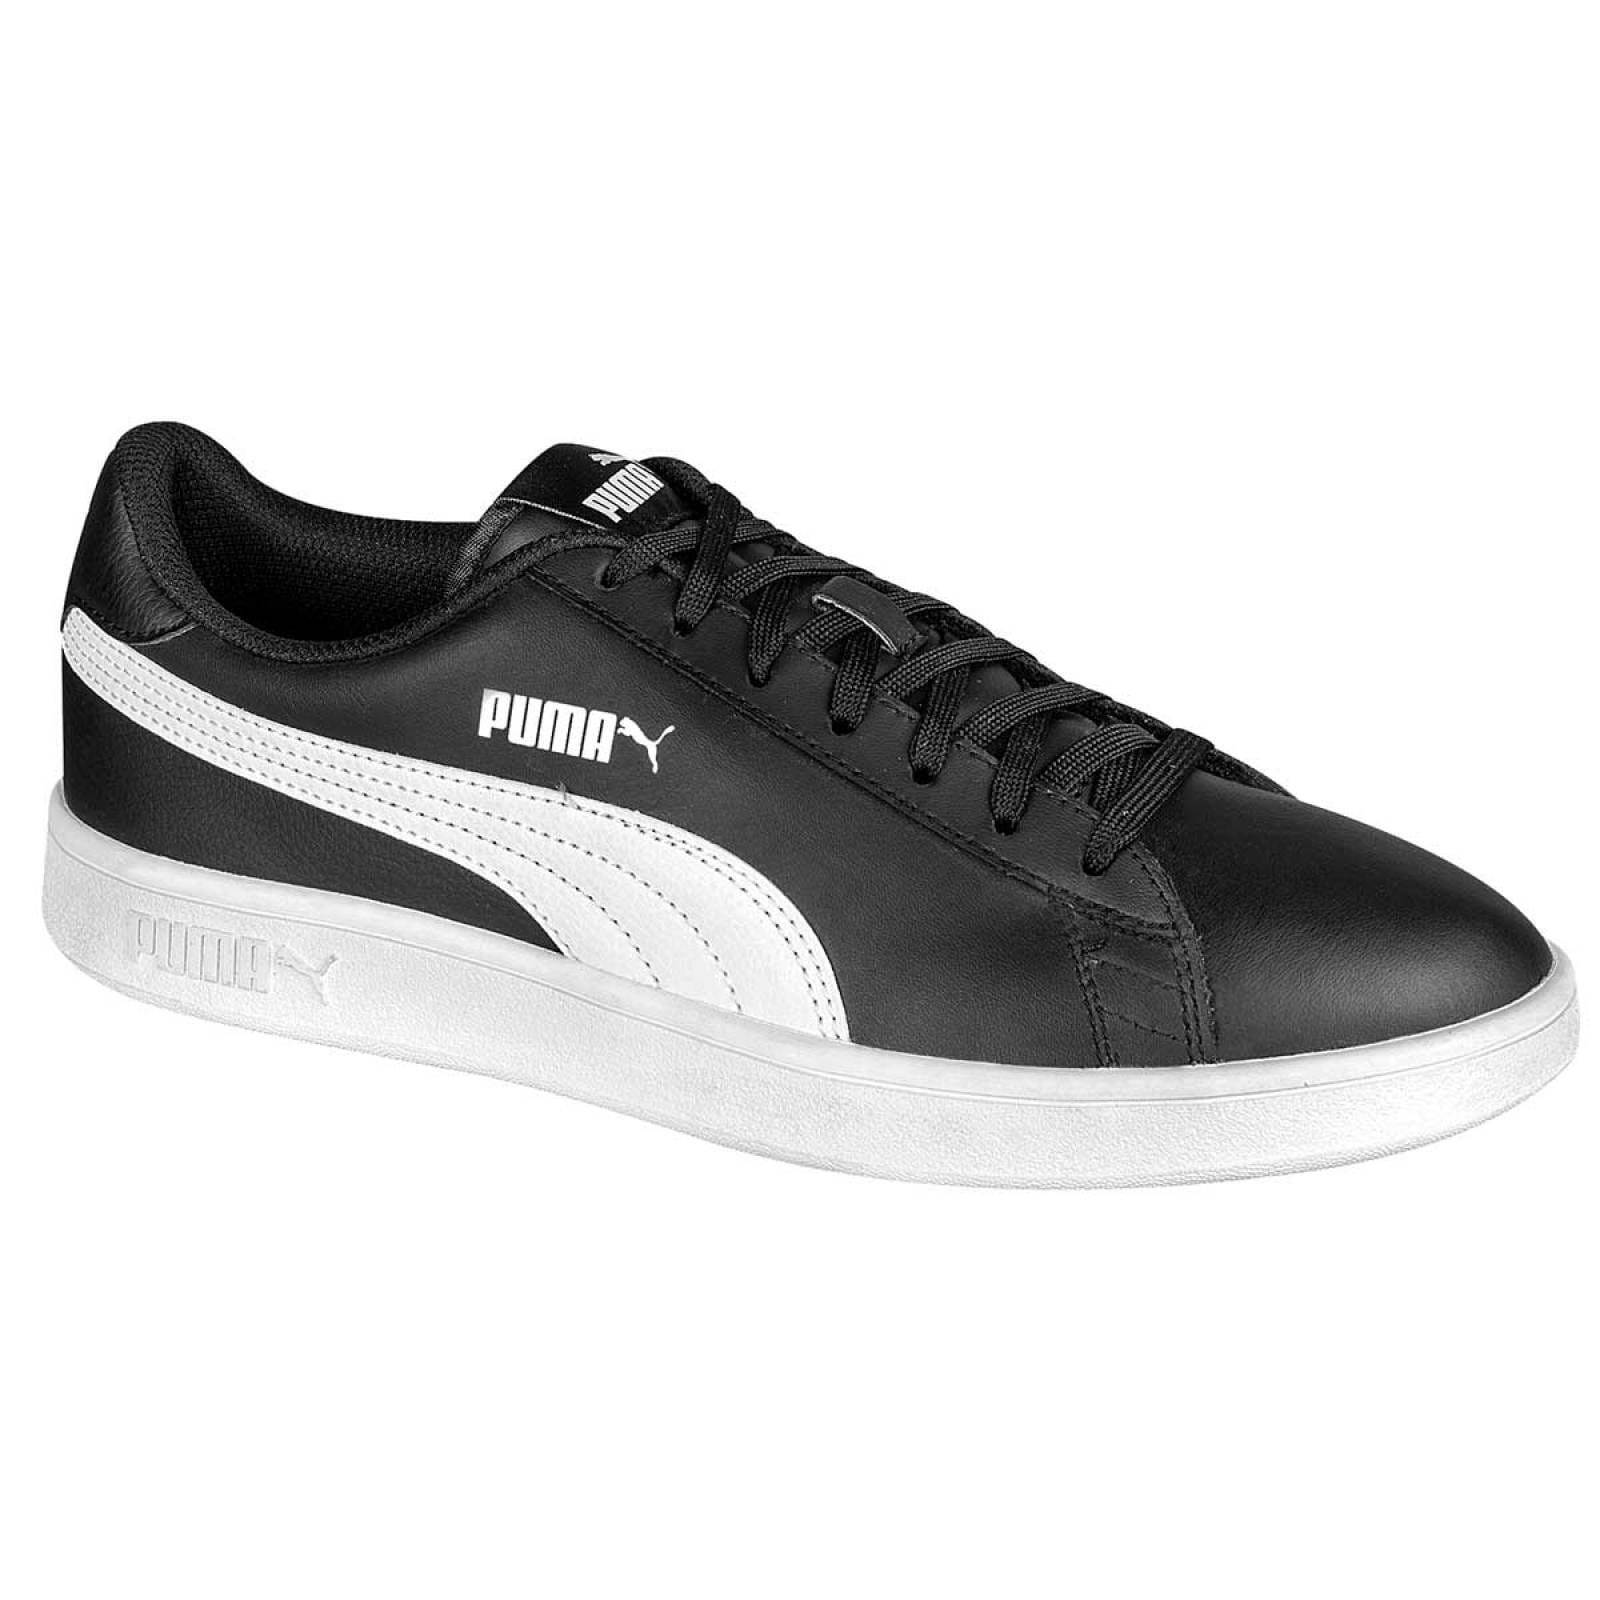 Puma Tenis de hombre 83355-1